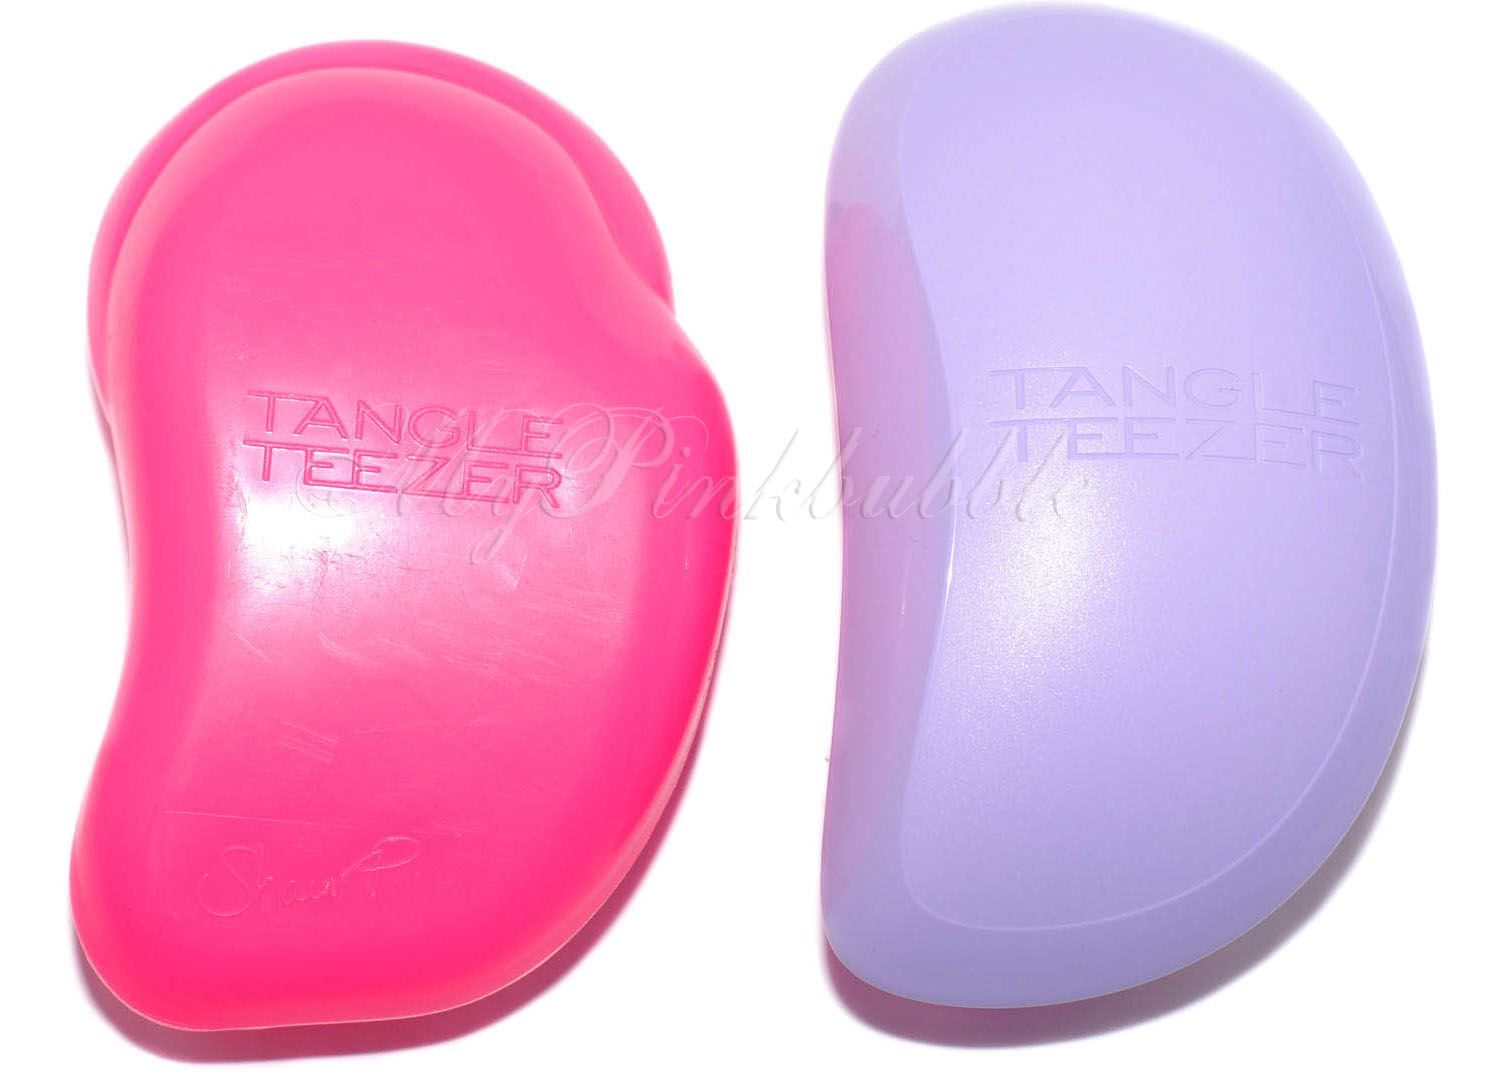 Tangle teezer nuevo